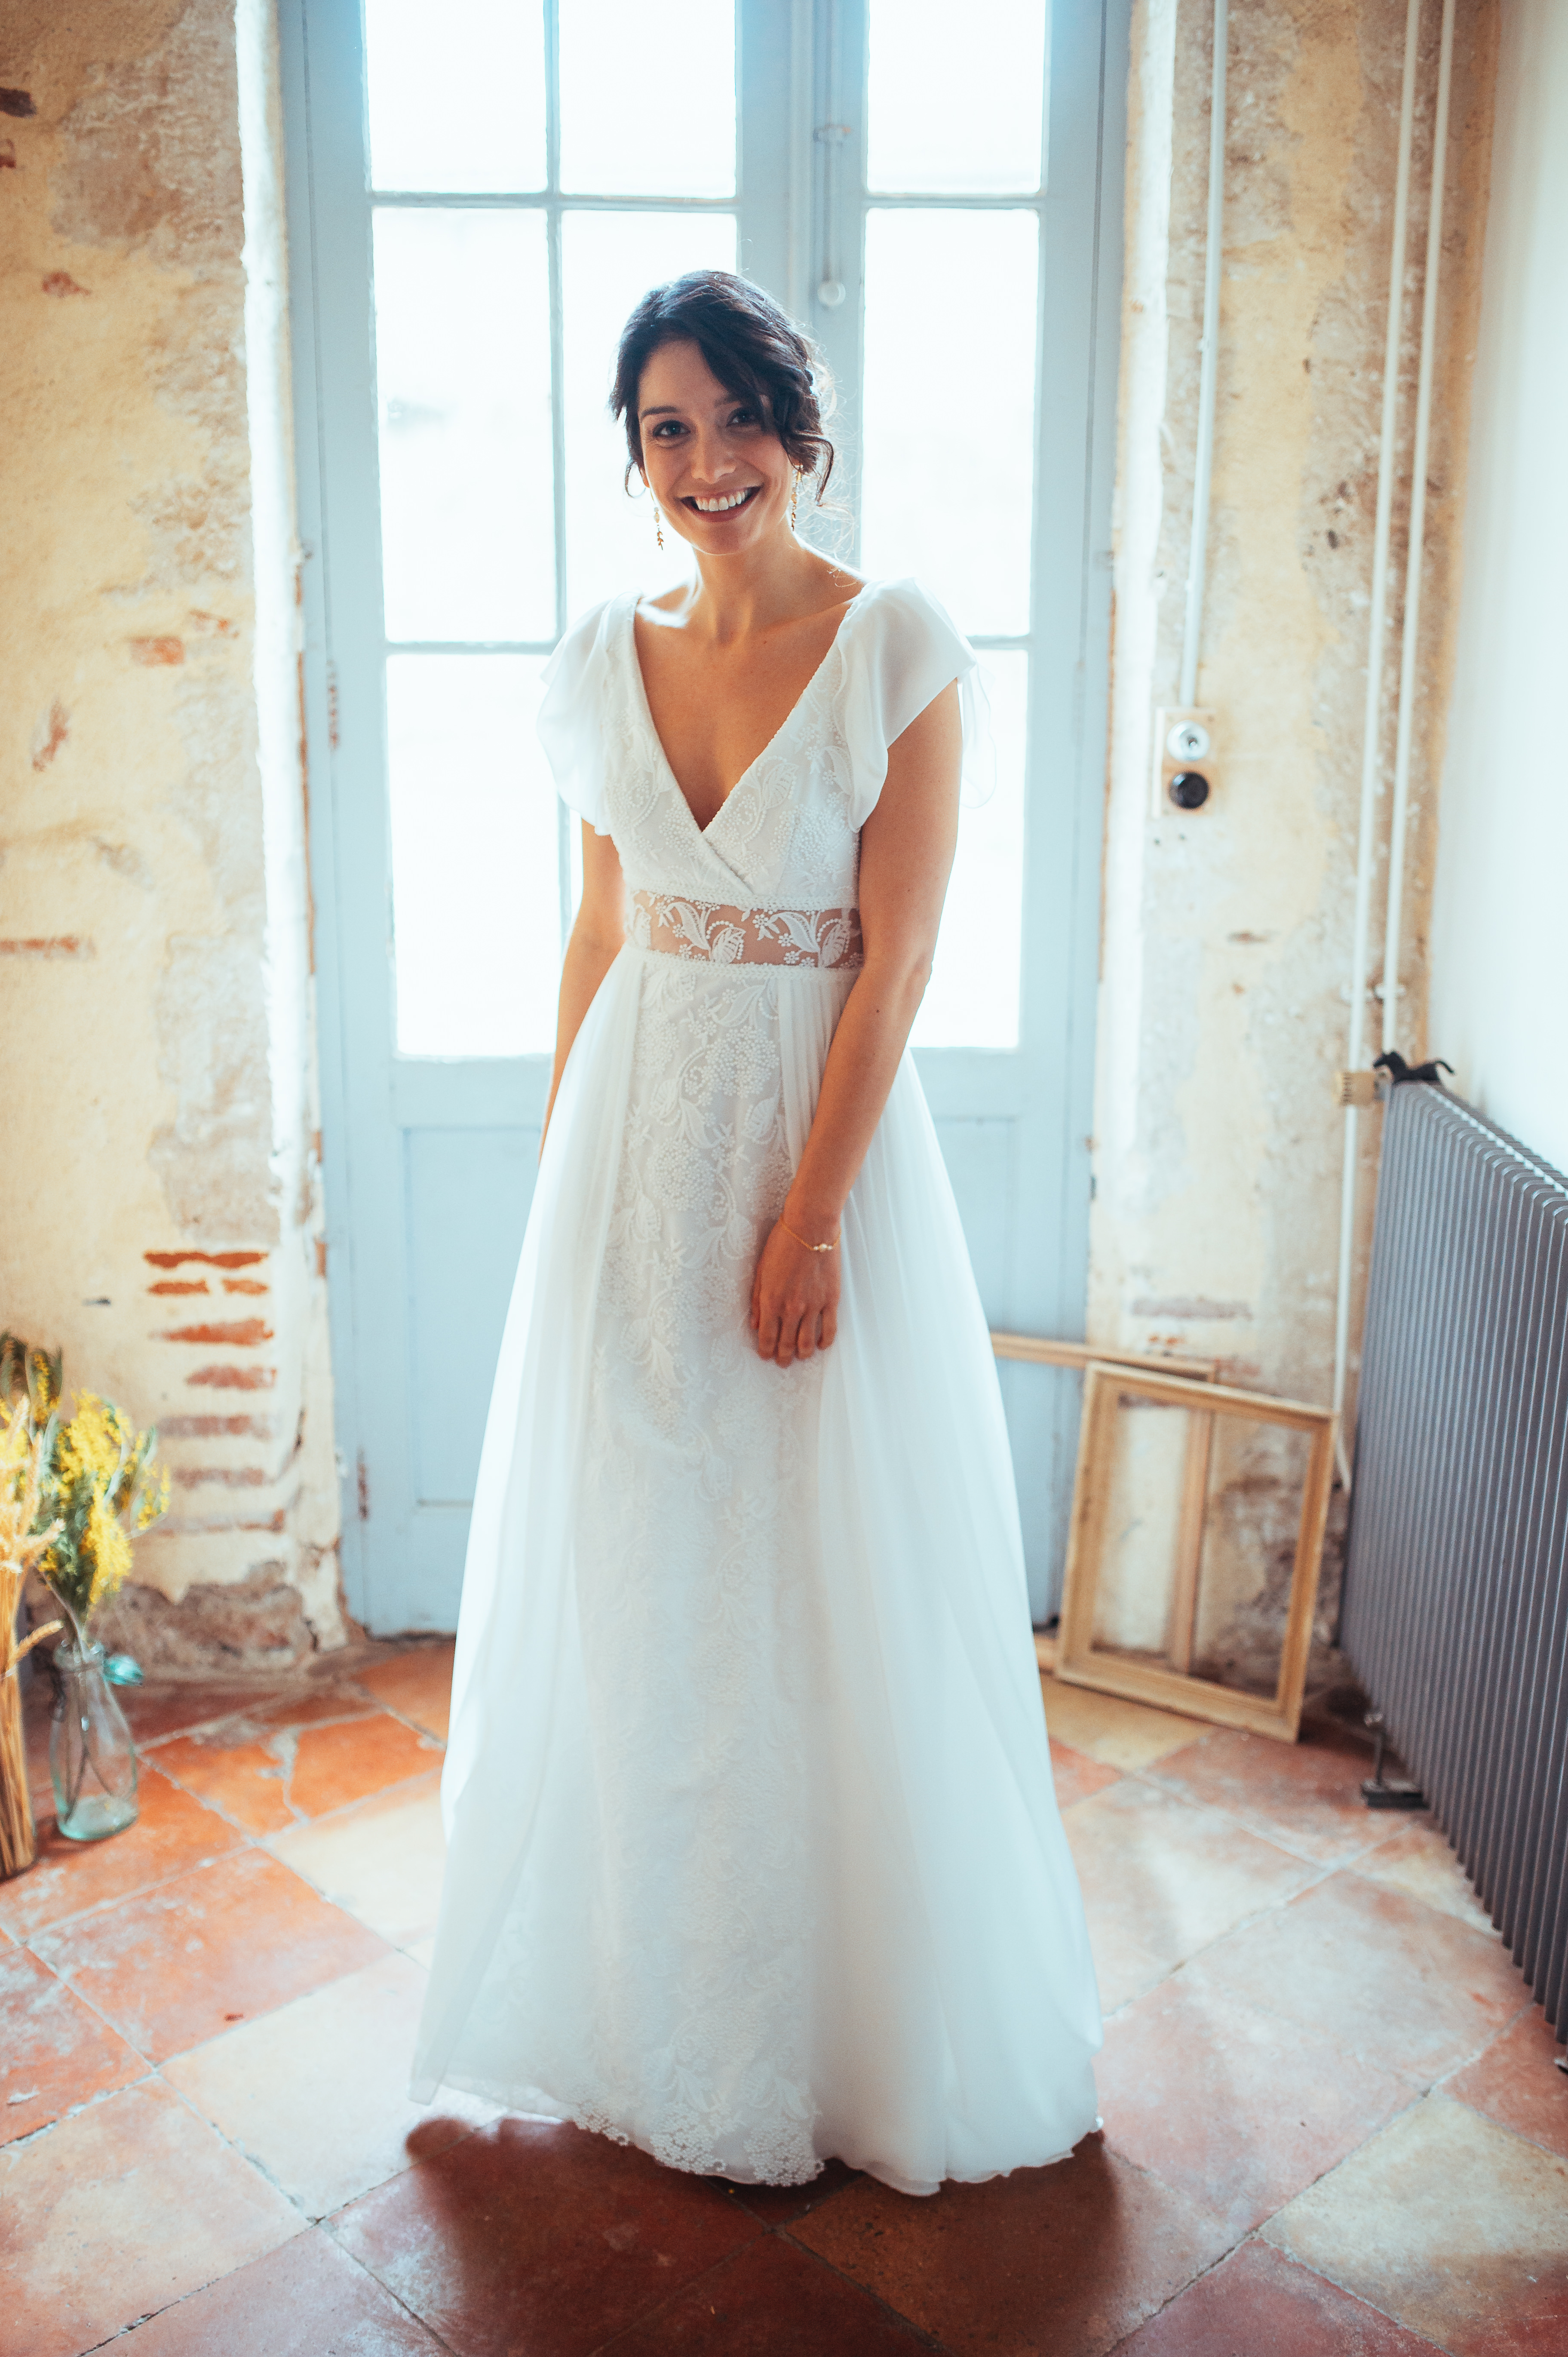 Robe Clothilde - Collection Elsa Gary 2021